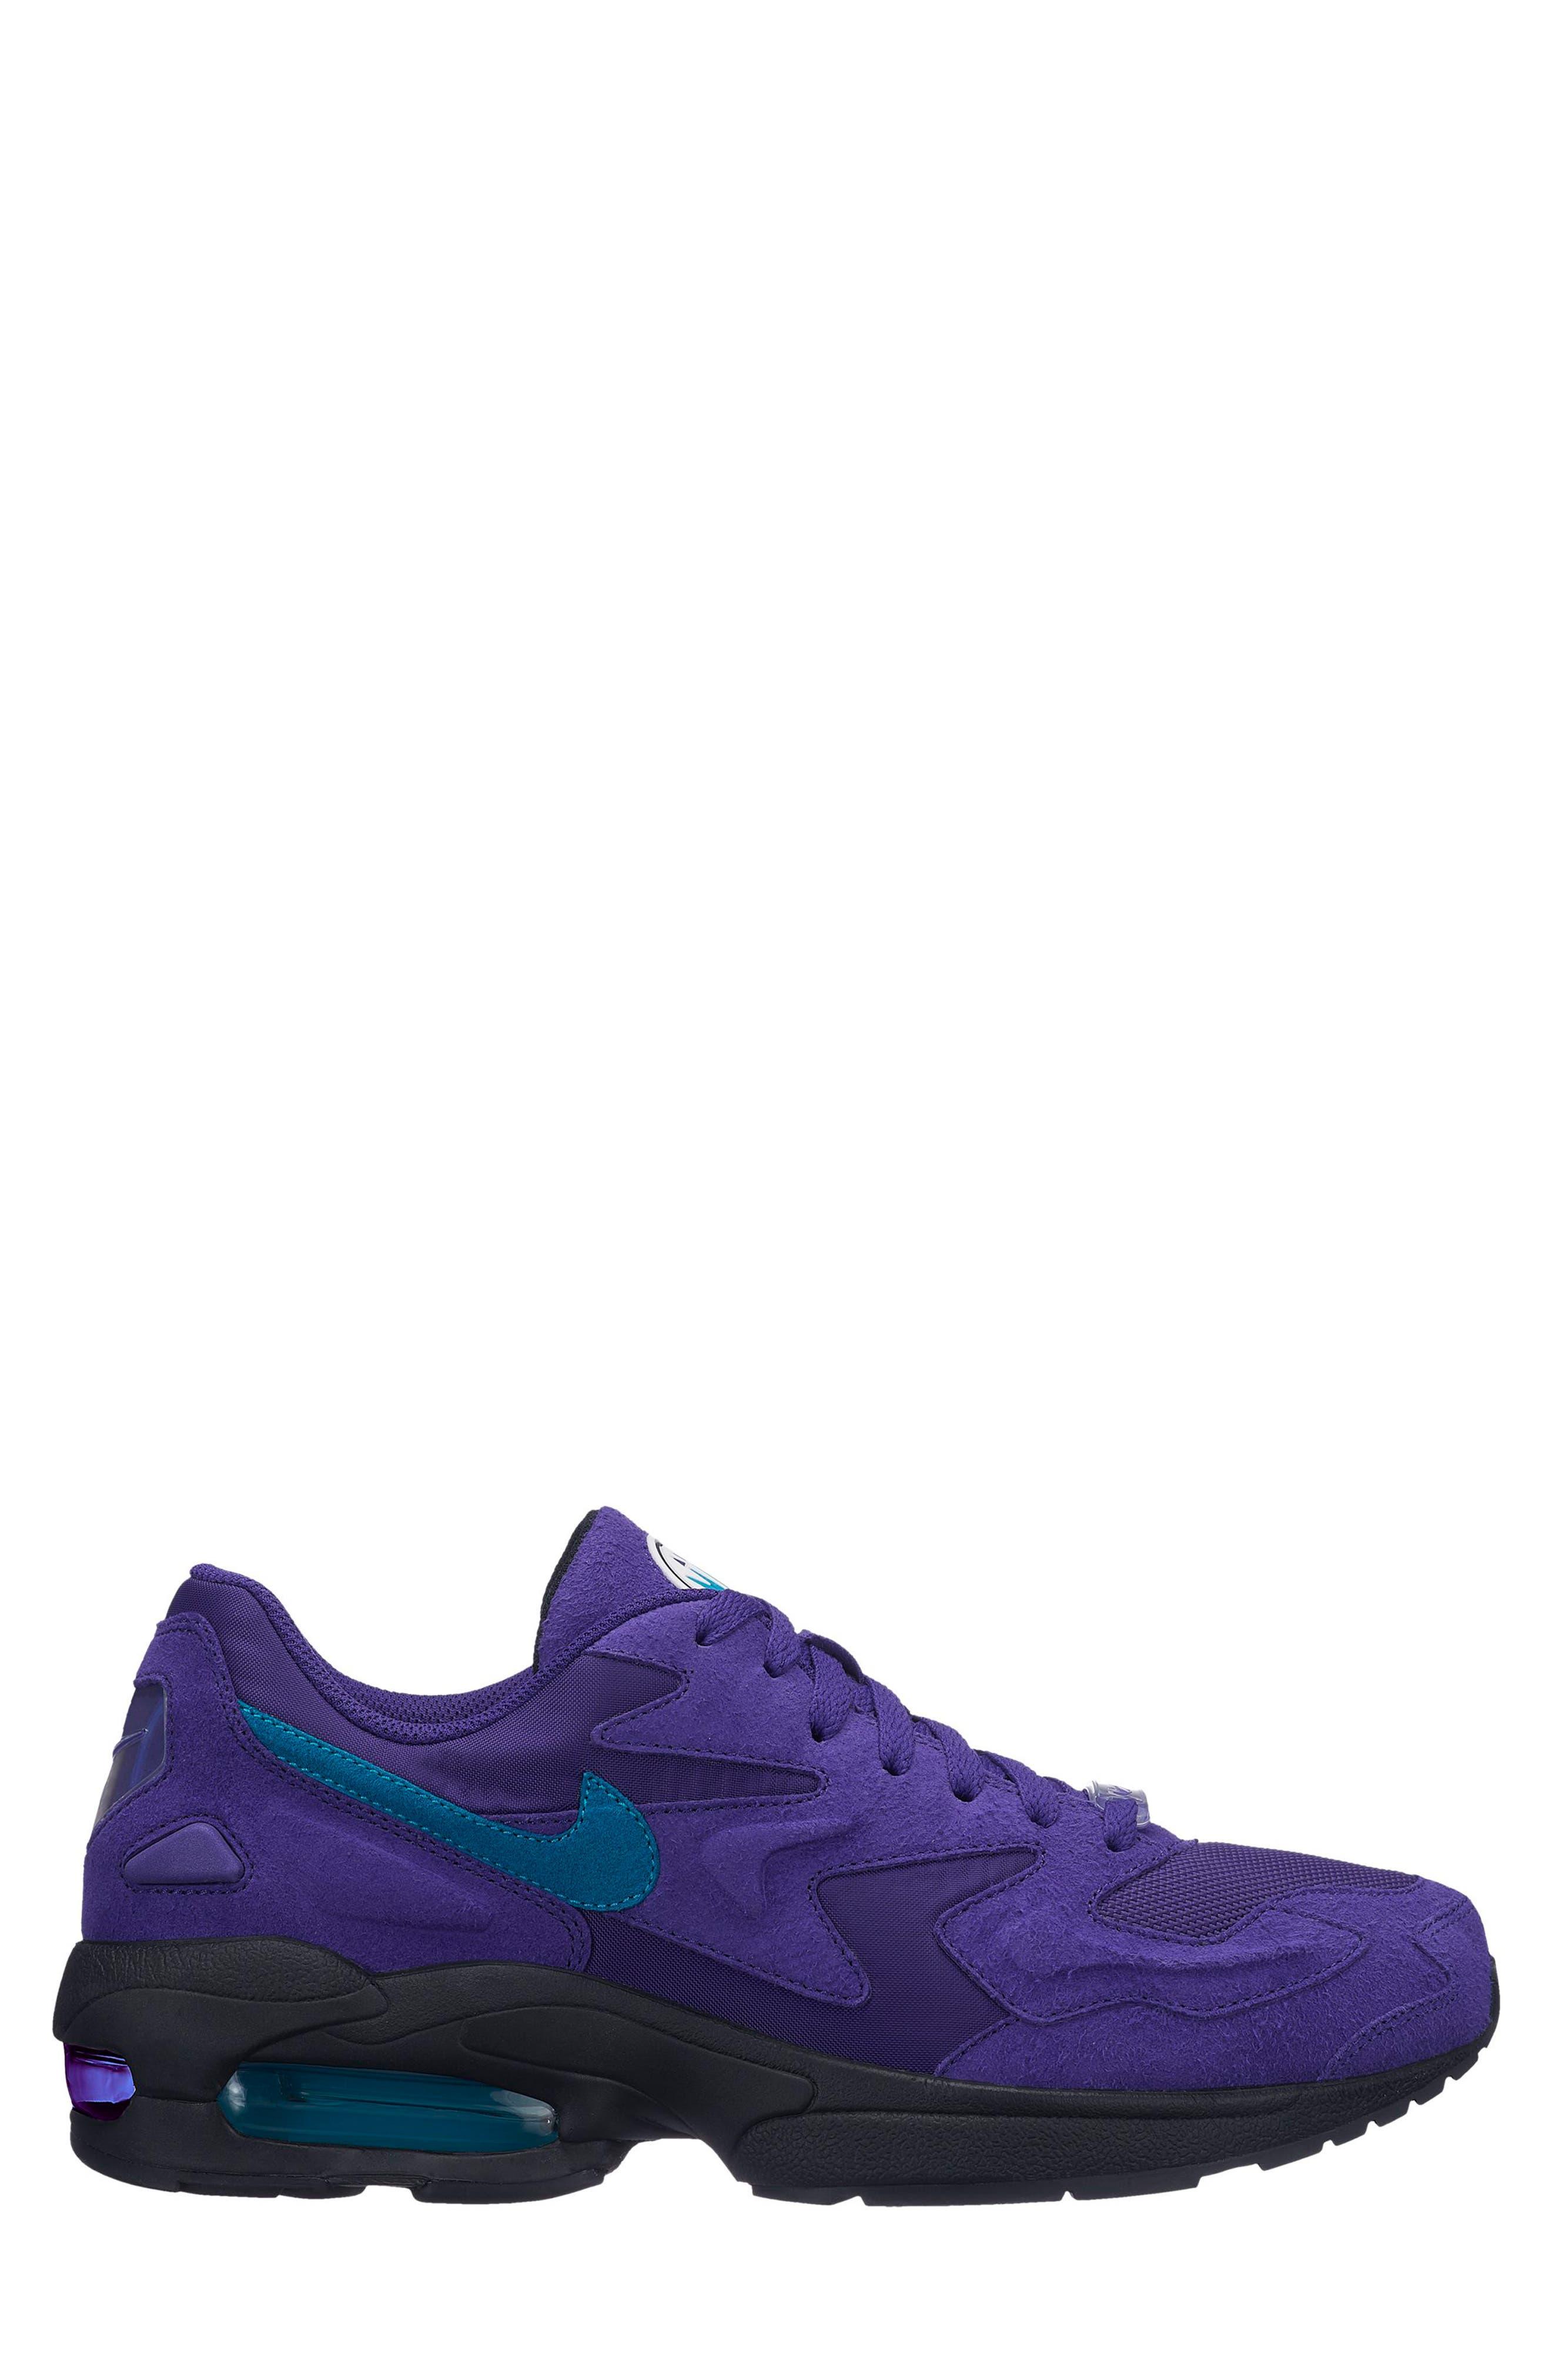 NIKE, Air Max2 Light Sneaker, Alternate thumbnail 3, color, PURPLE/ TEAL/ BLACK/ WHITE